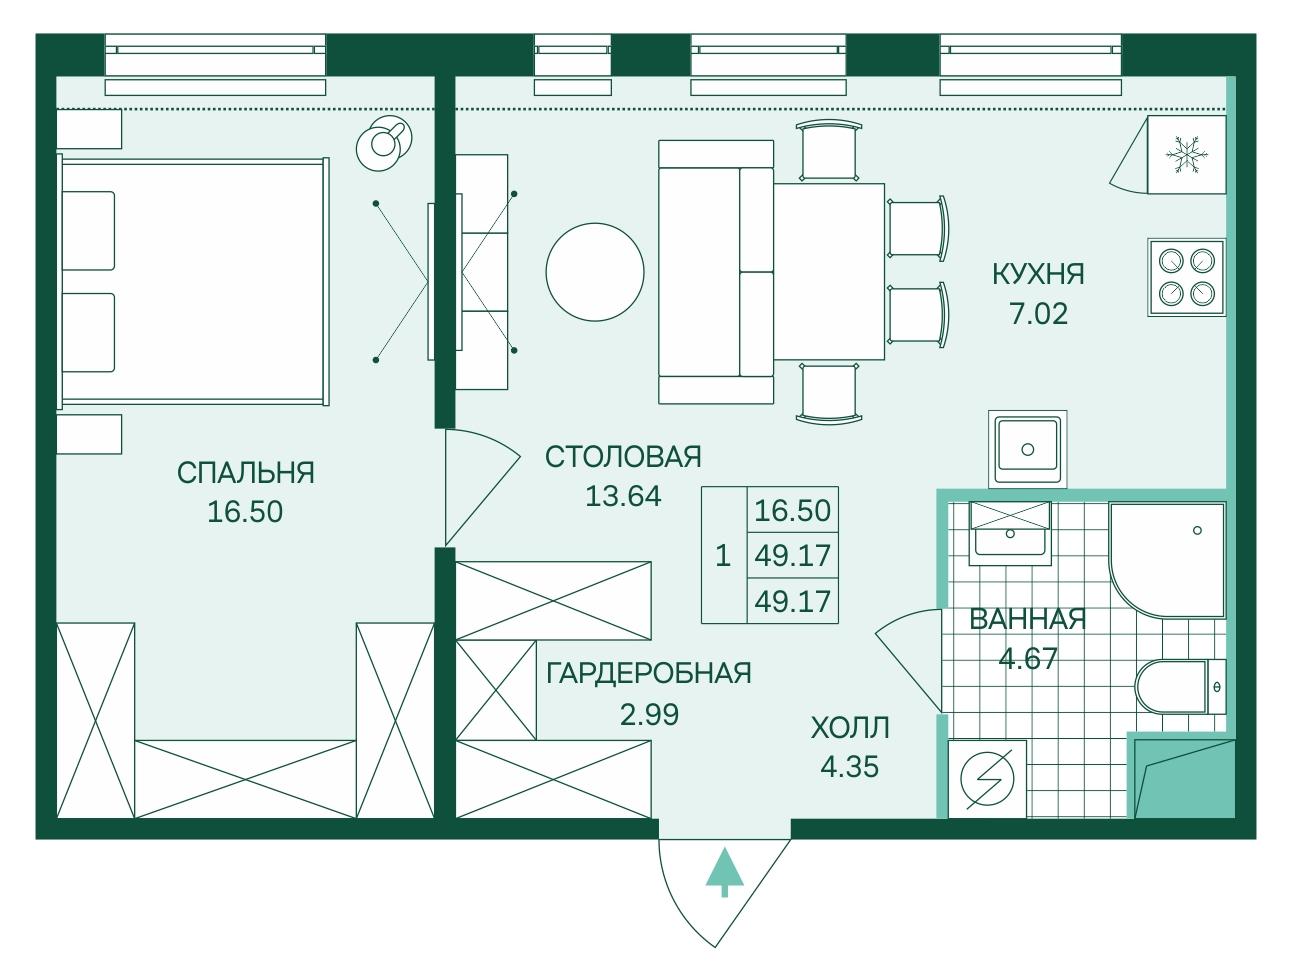 Планировка Двухкомнатная квартира (Евро) площадью 49.17 кв.м в ЖК «Skandi Klubb»